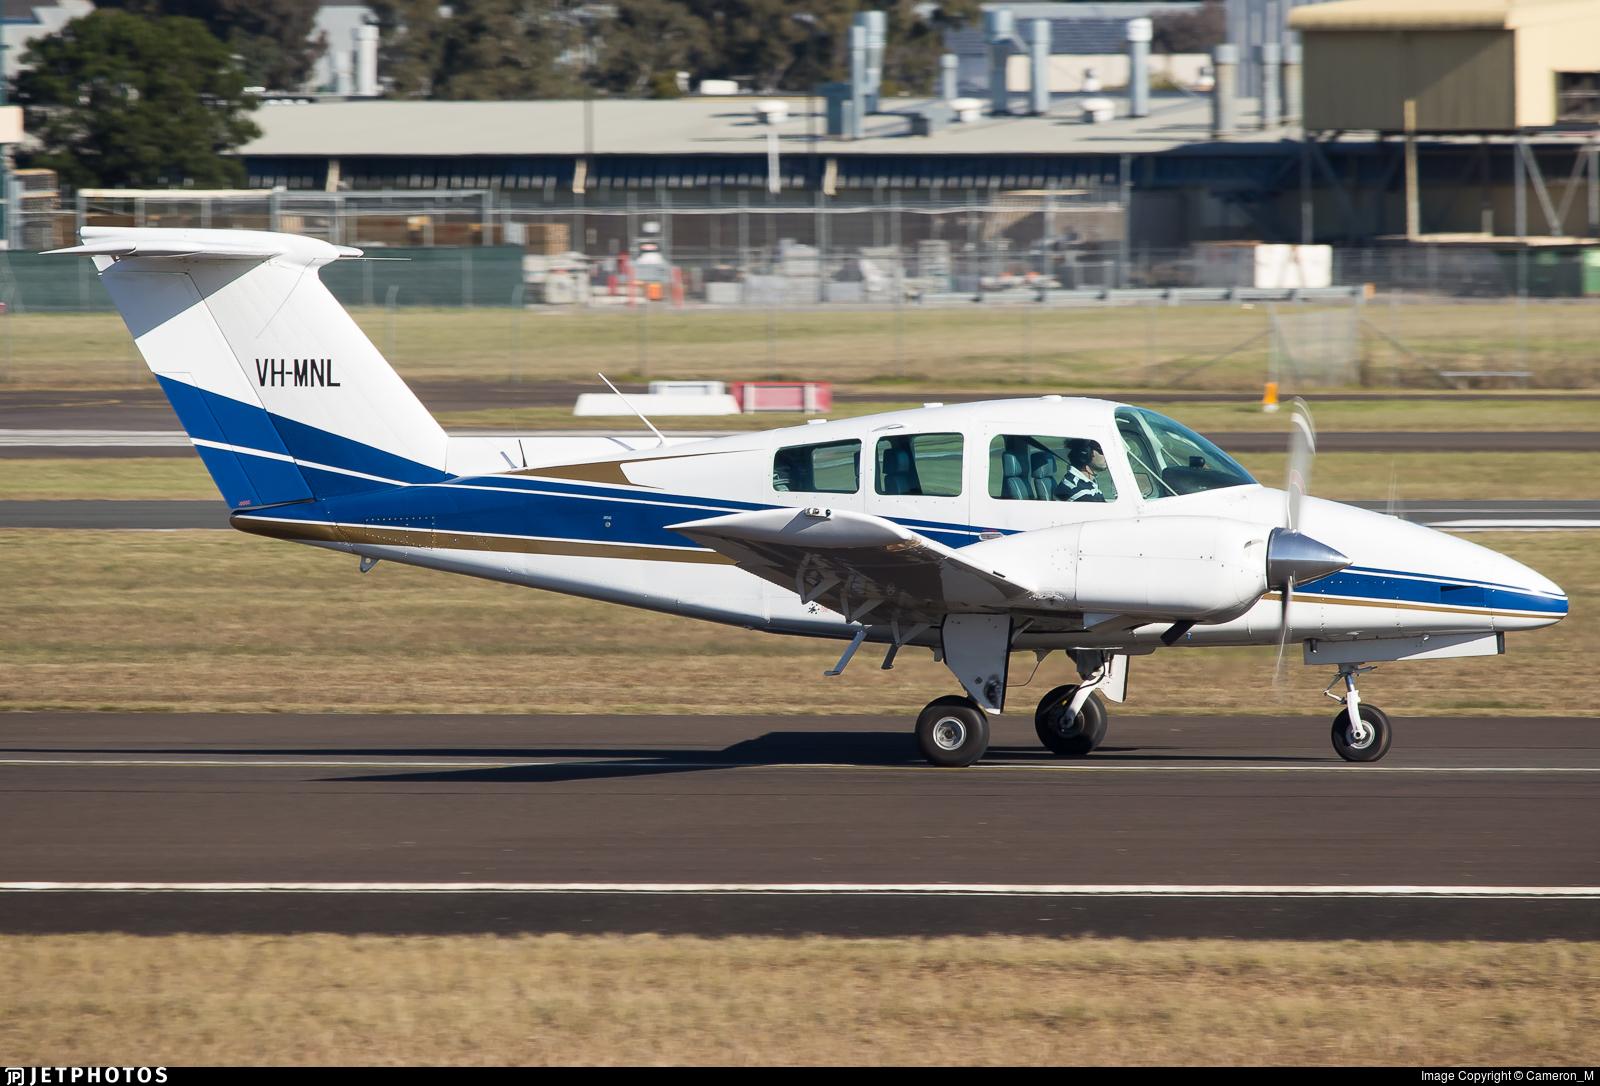 VH-MNL - Beechcraft 76 Duchess - Private